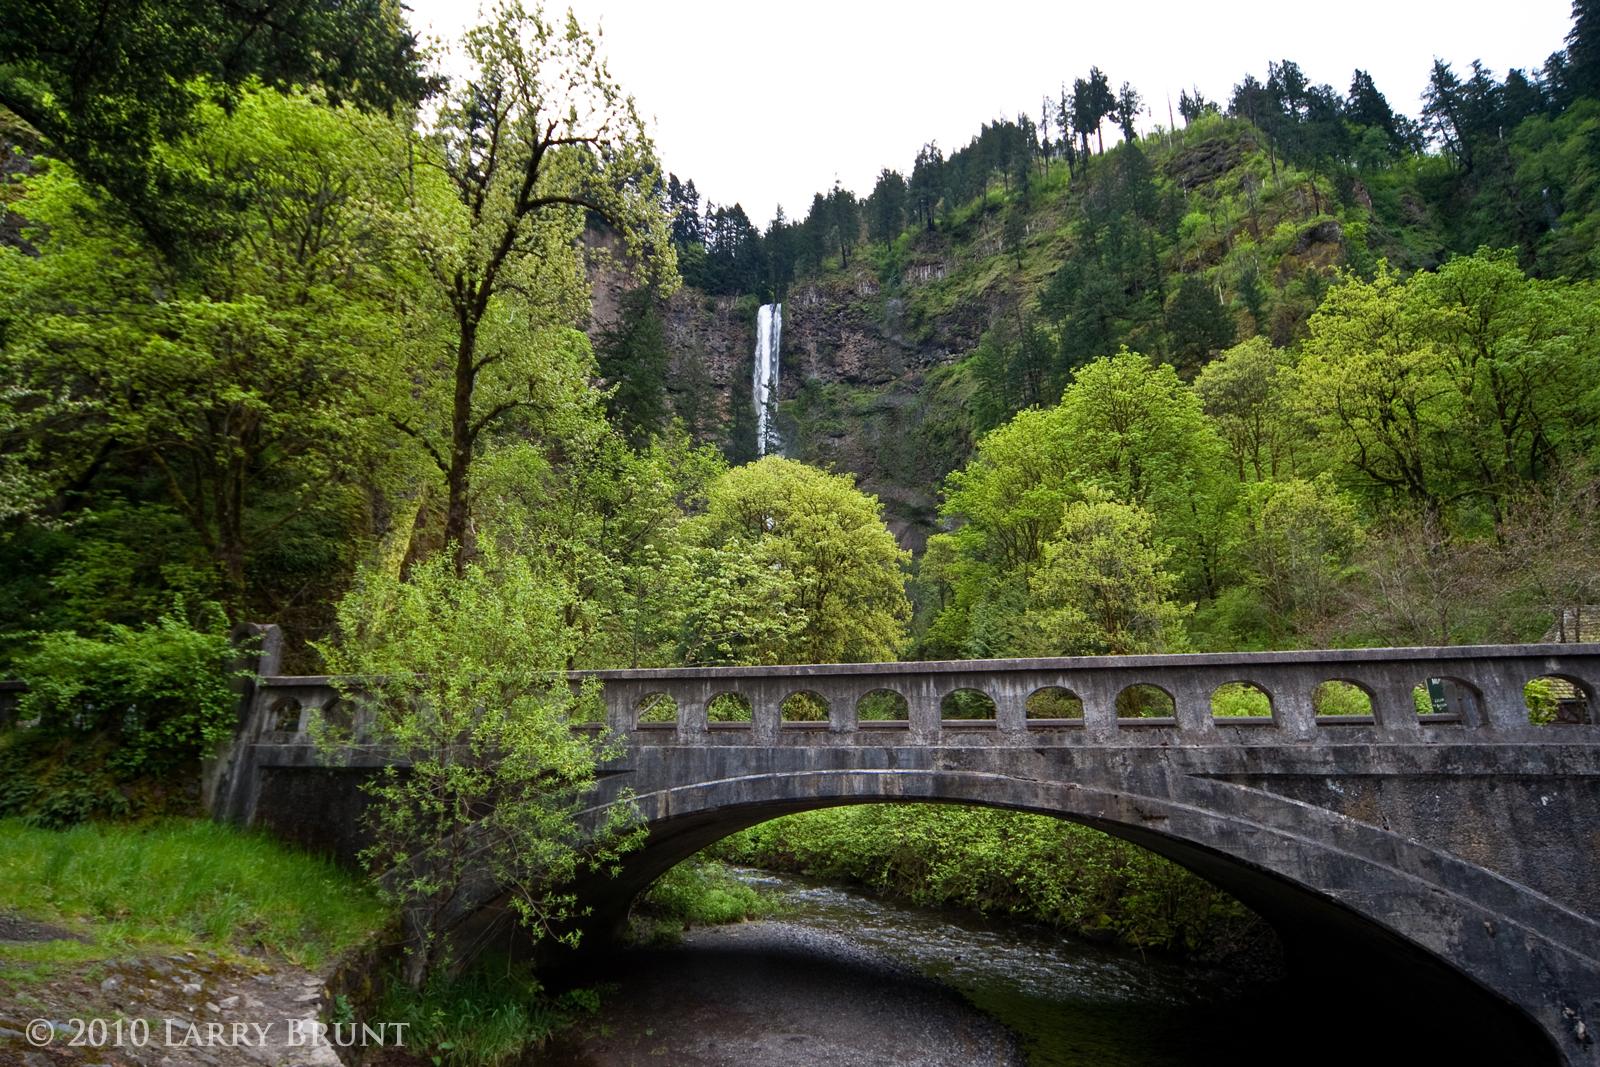 Multnomah Falls and Bridge by inessentialstuff